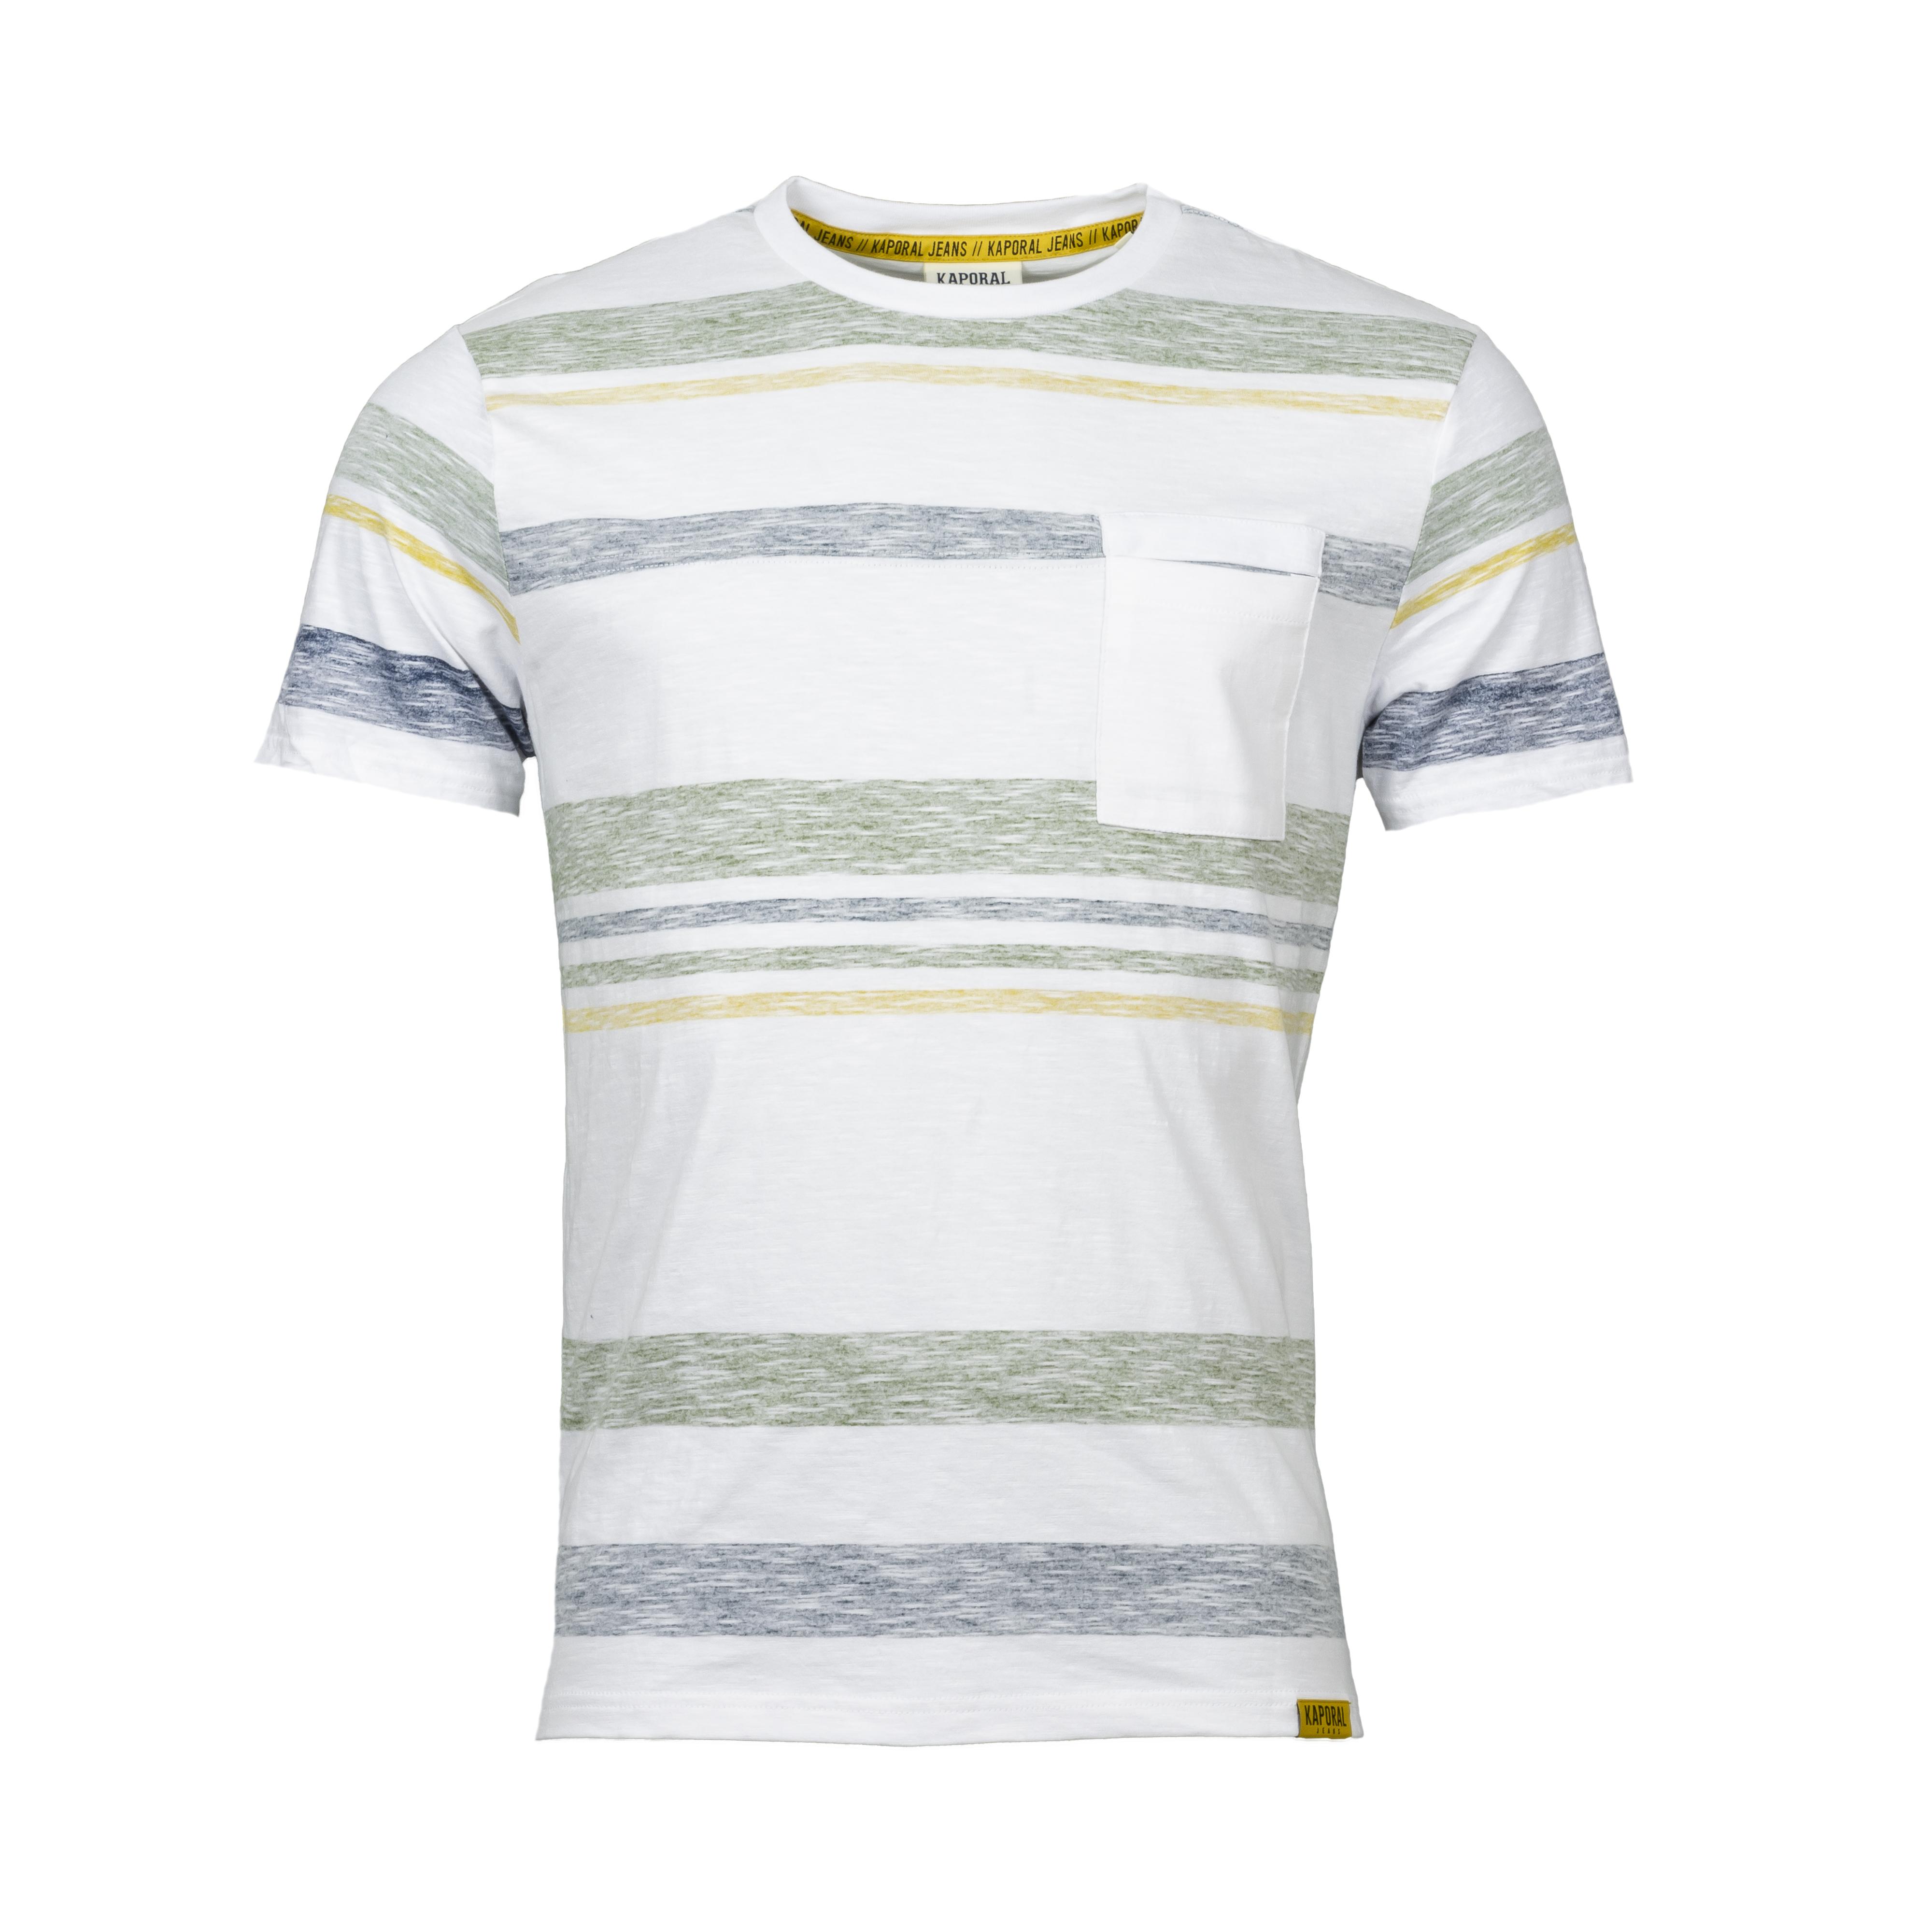 Tee-shirt col rond  tikkae en coton blanc rayé vert jaune et gris bleuté